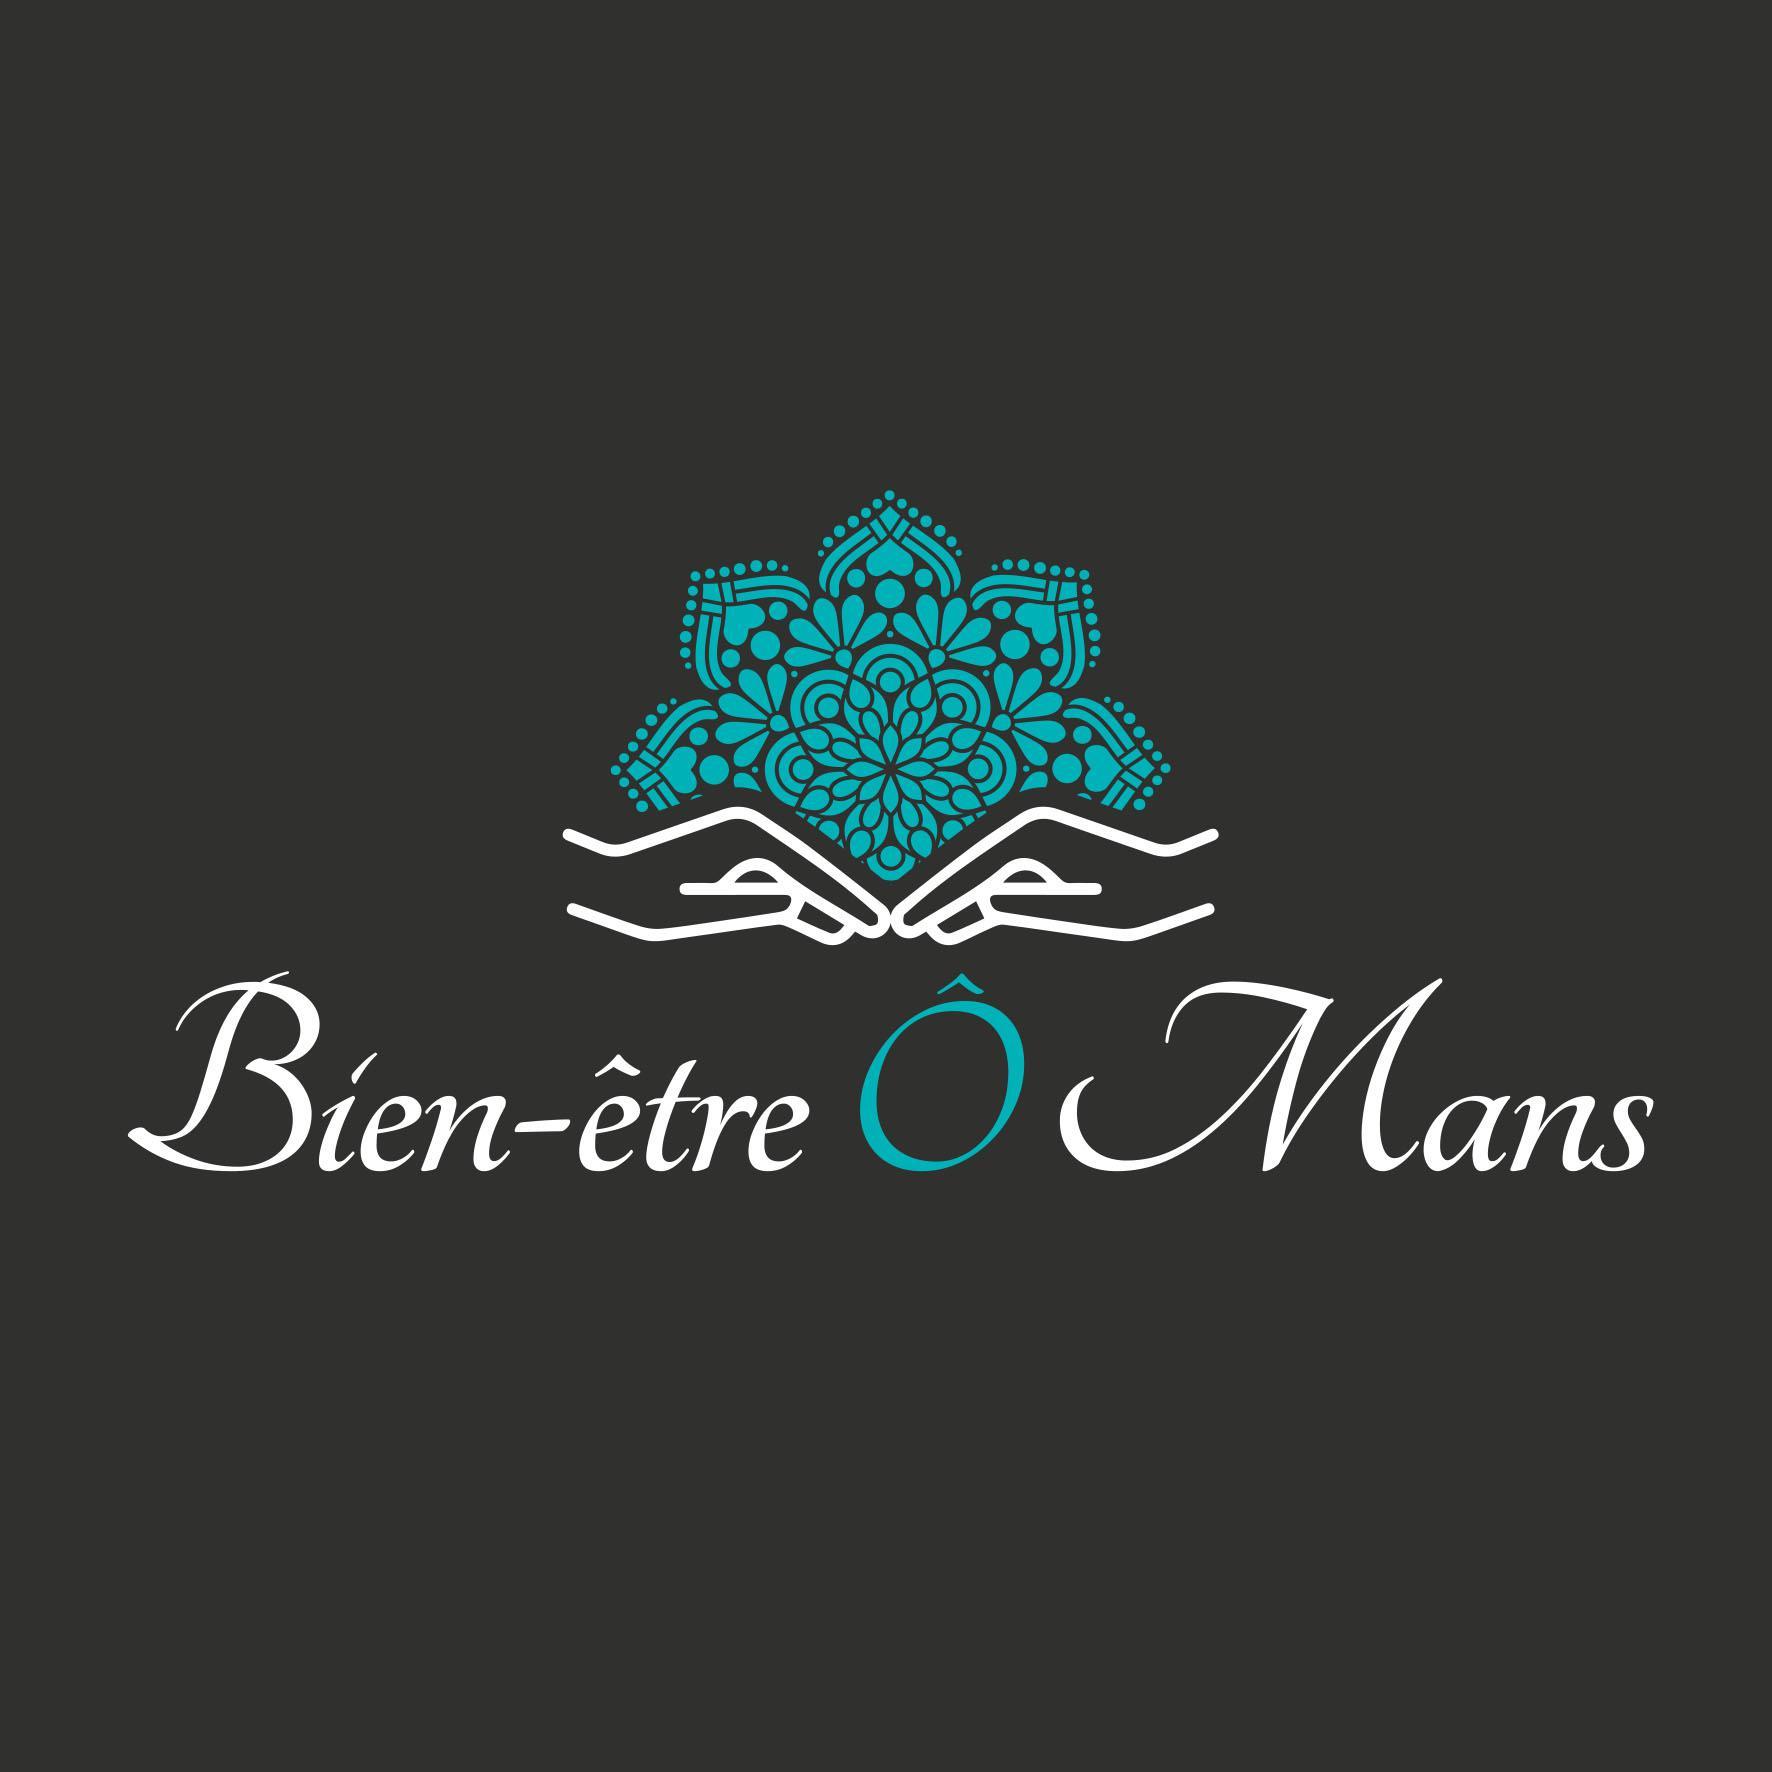 Logo Bien Etre O Mans